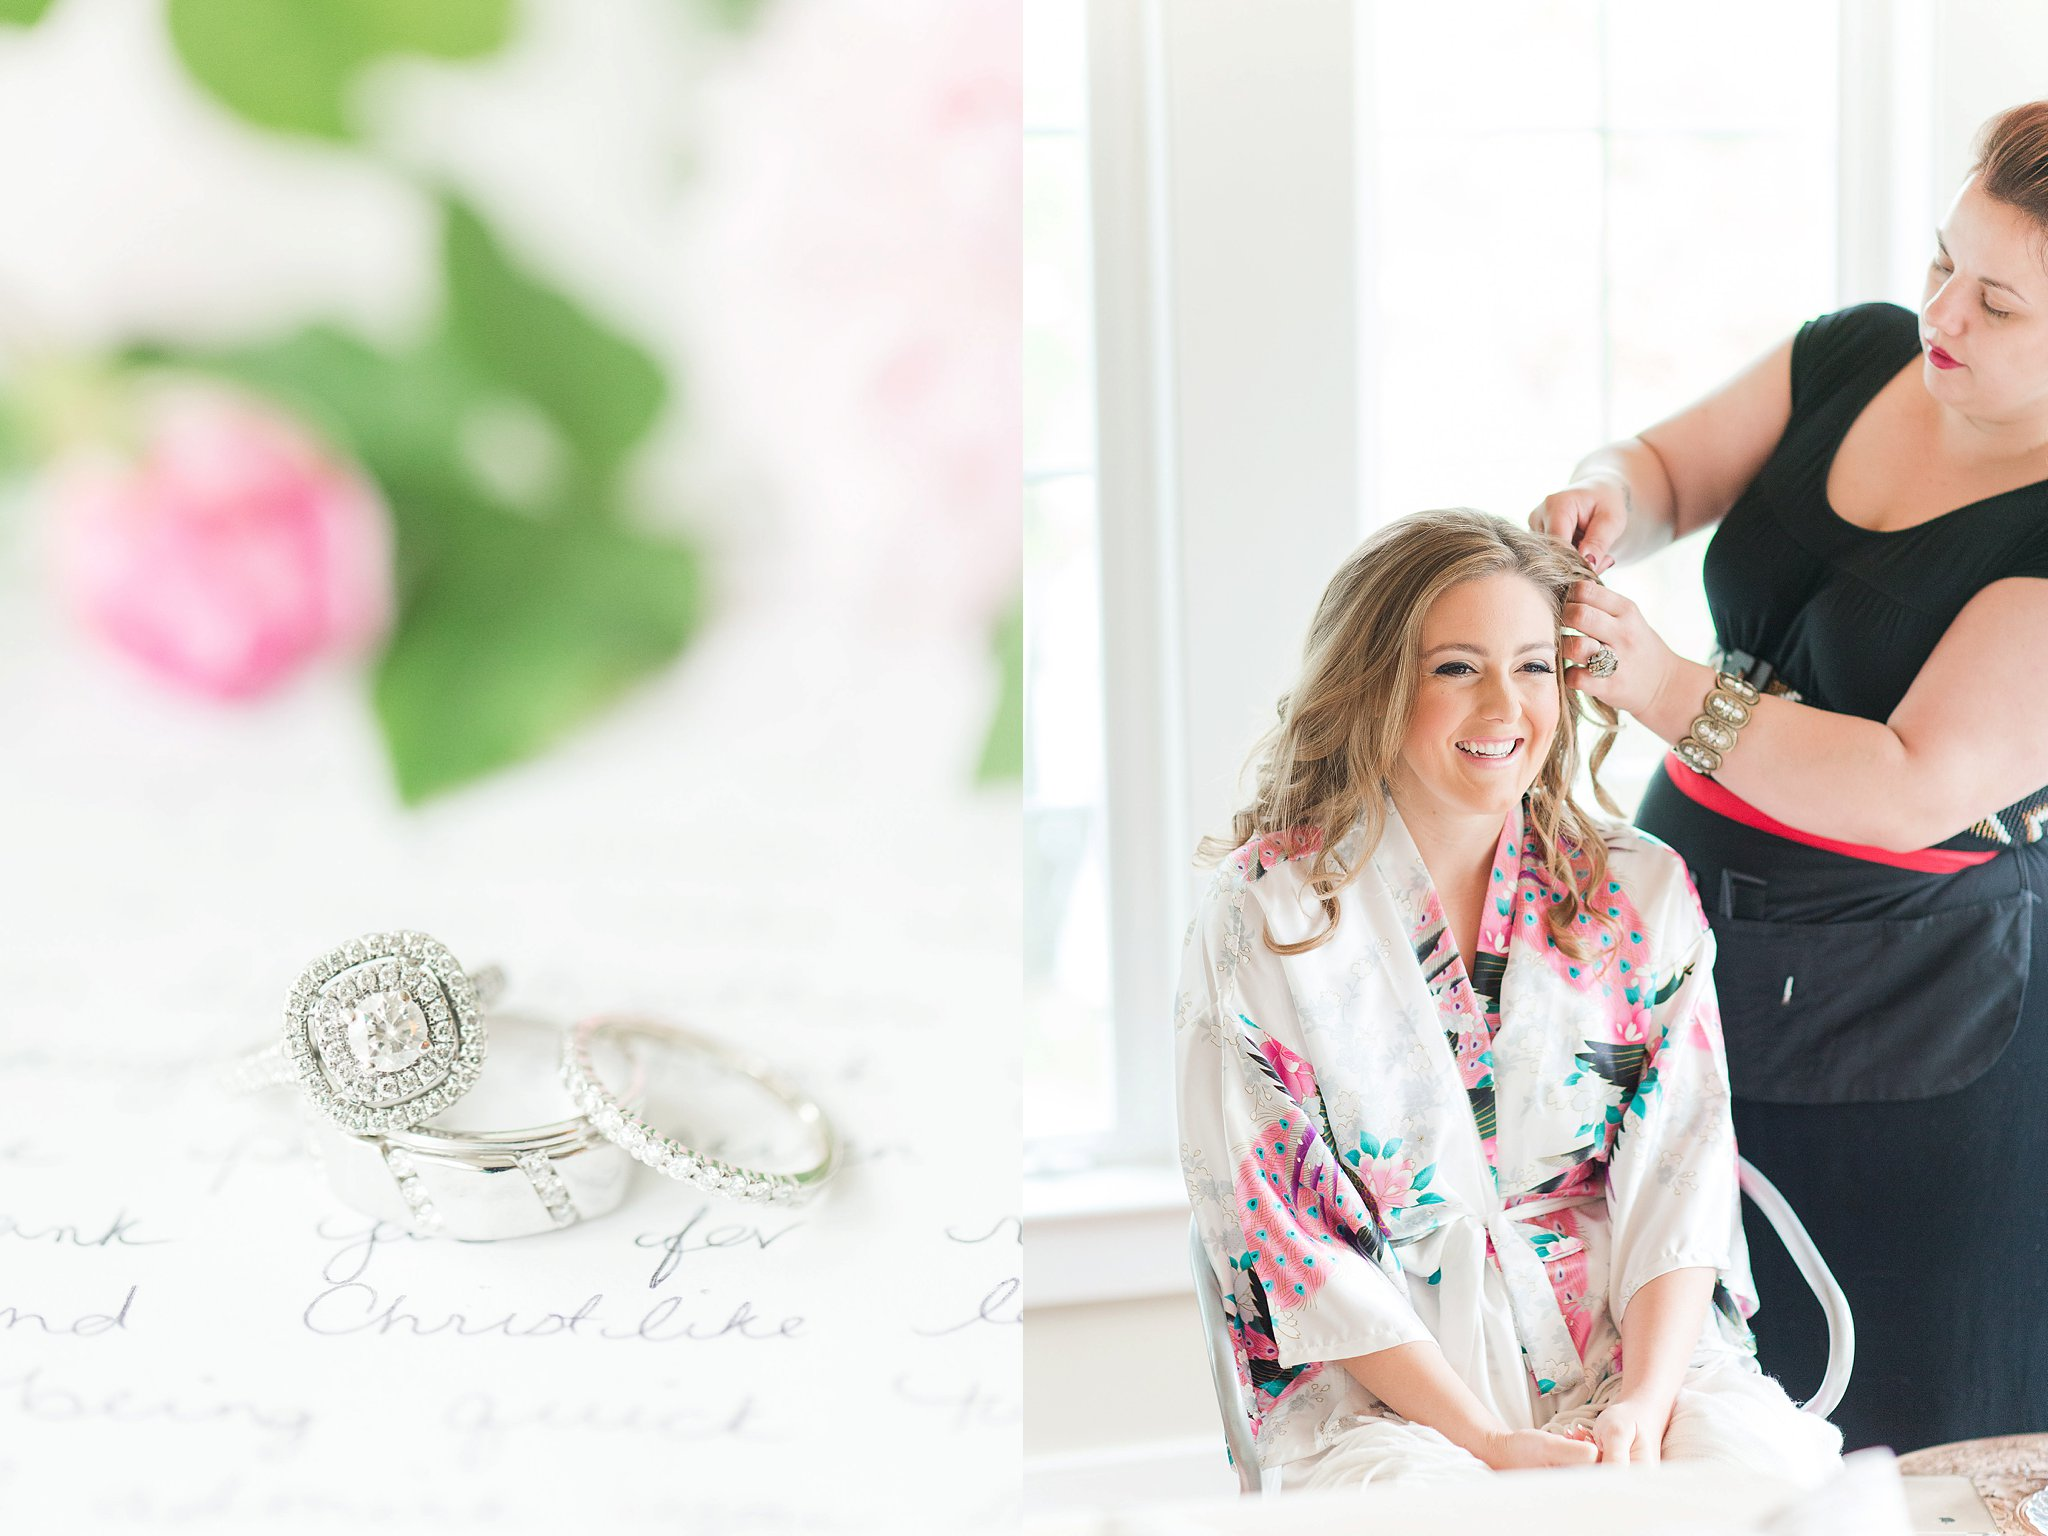 Justin & Megan Big Spring Farm Wedding Photos-10.jpg